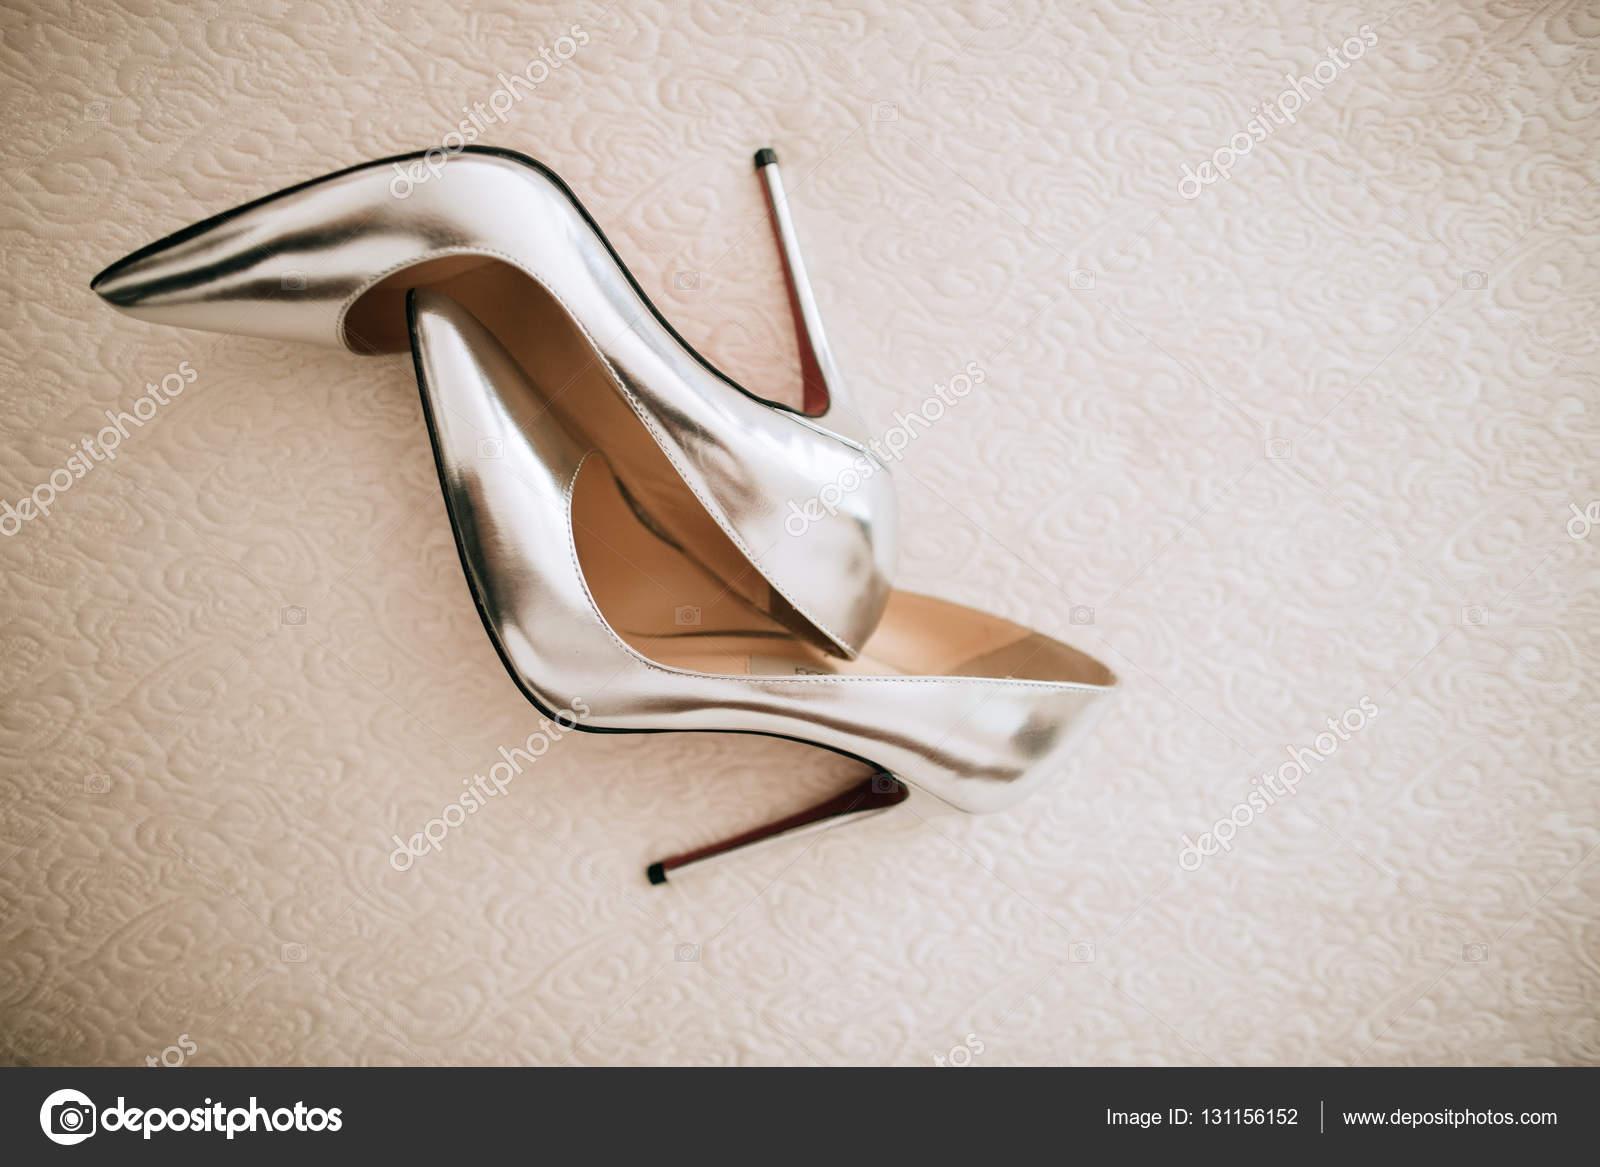 e527155ffea493 Silber Brautschuhe — Stockfoto © beorm  131156152